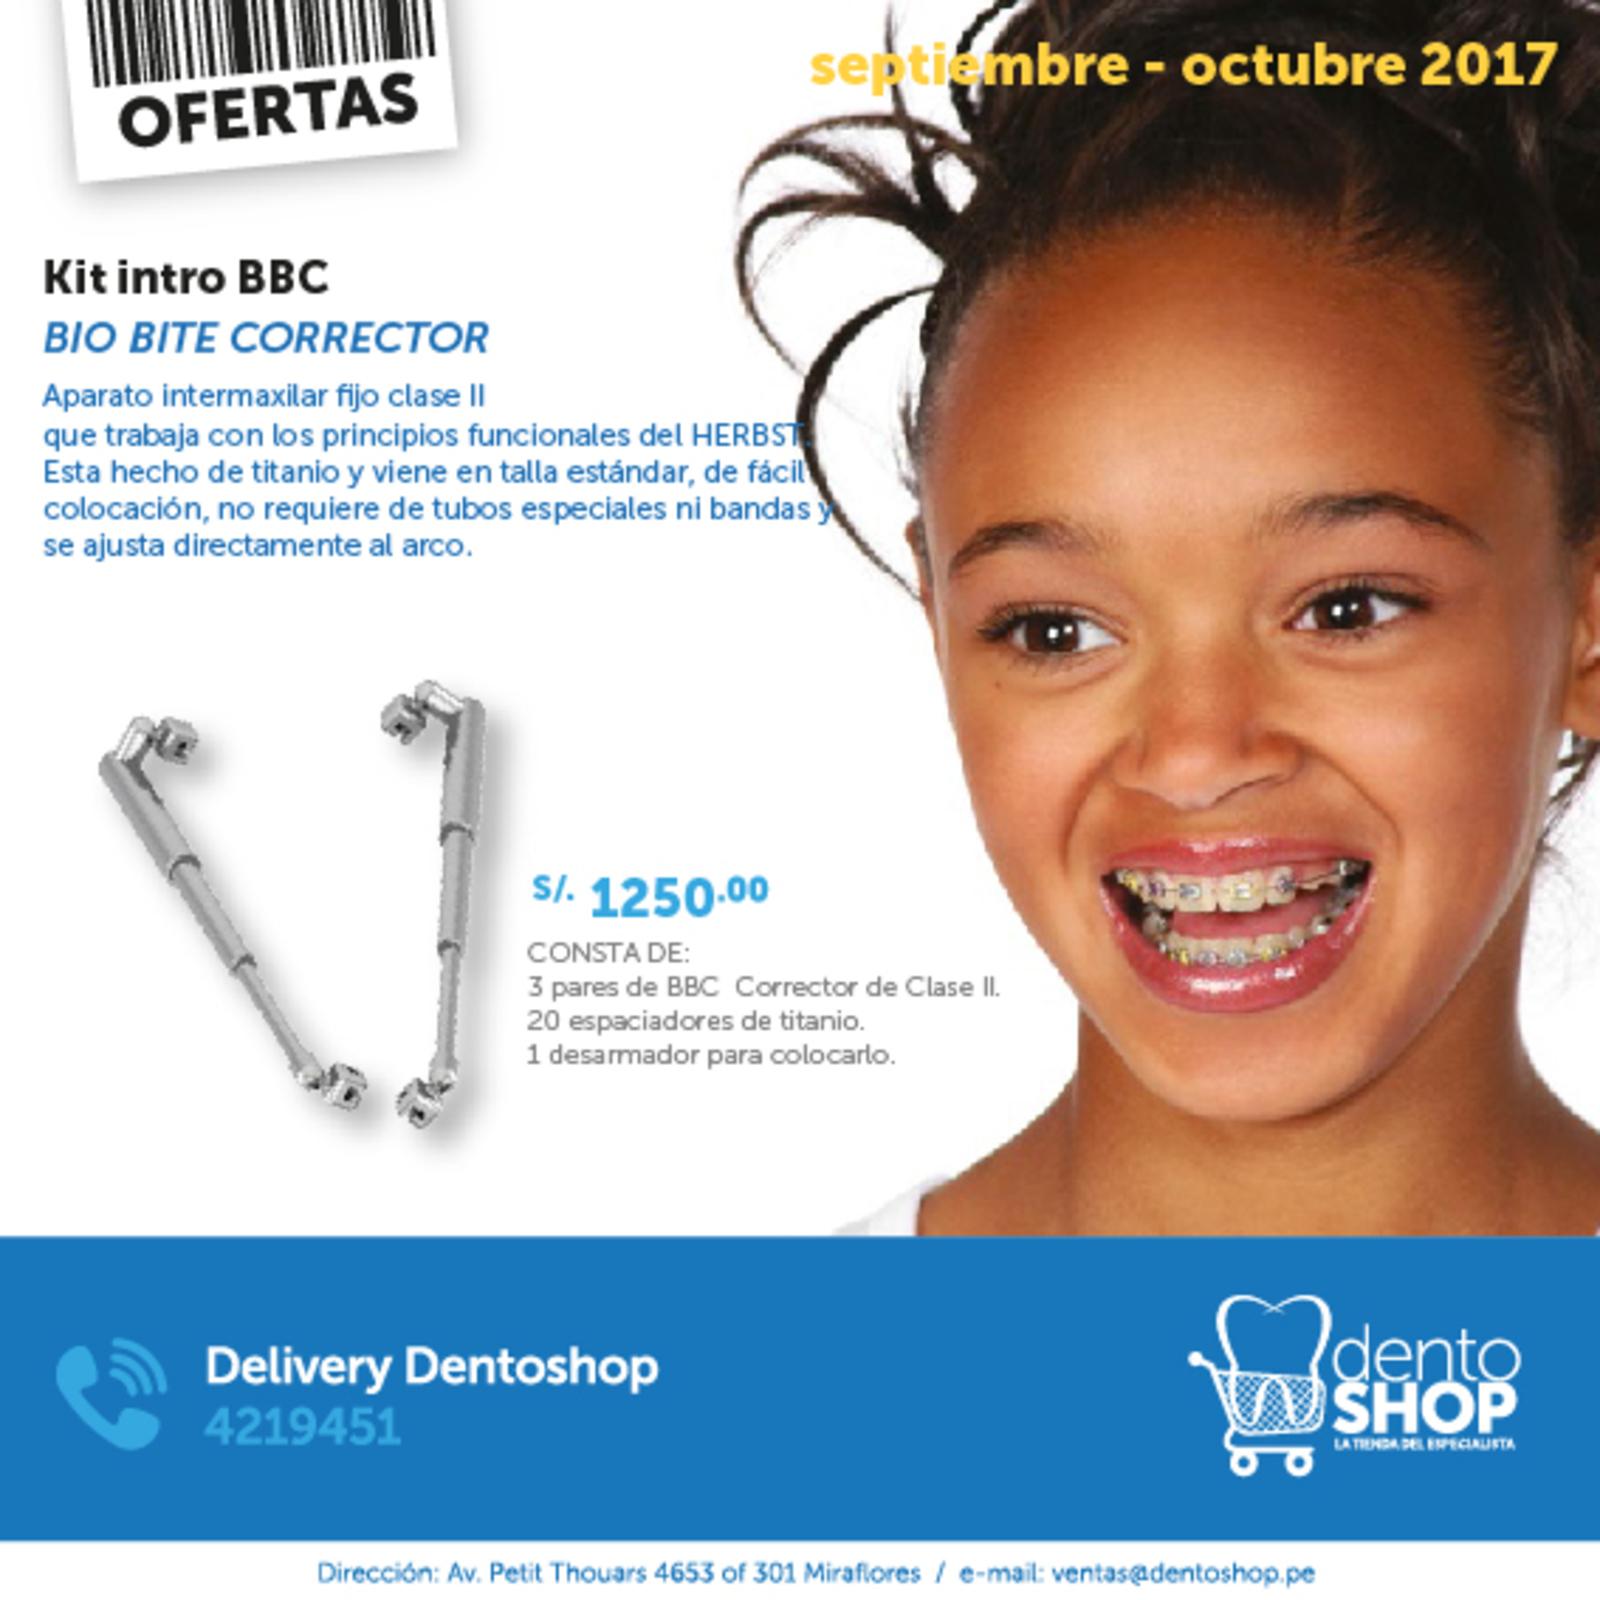 BOLETÍN DE OFERTAS SEPTIEMBRE-OCTUBRE